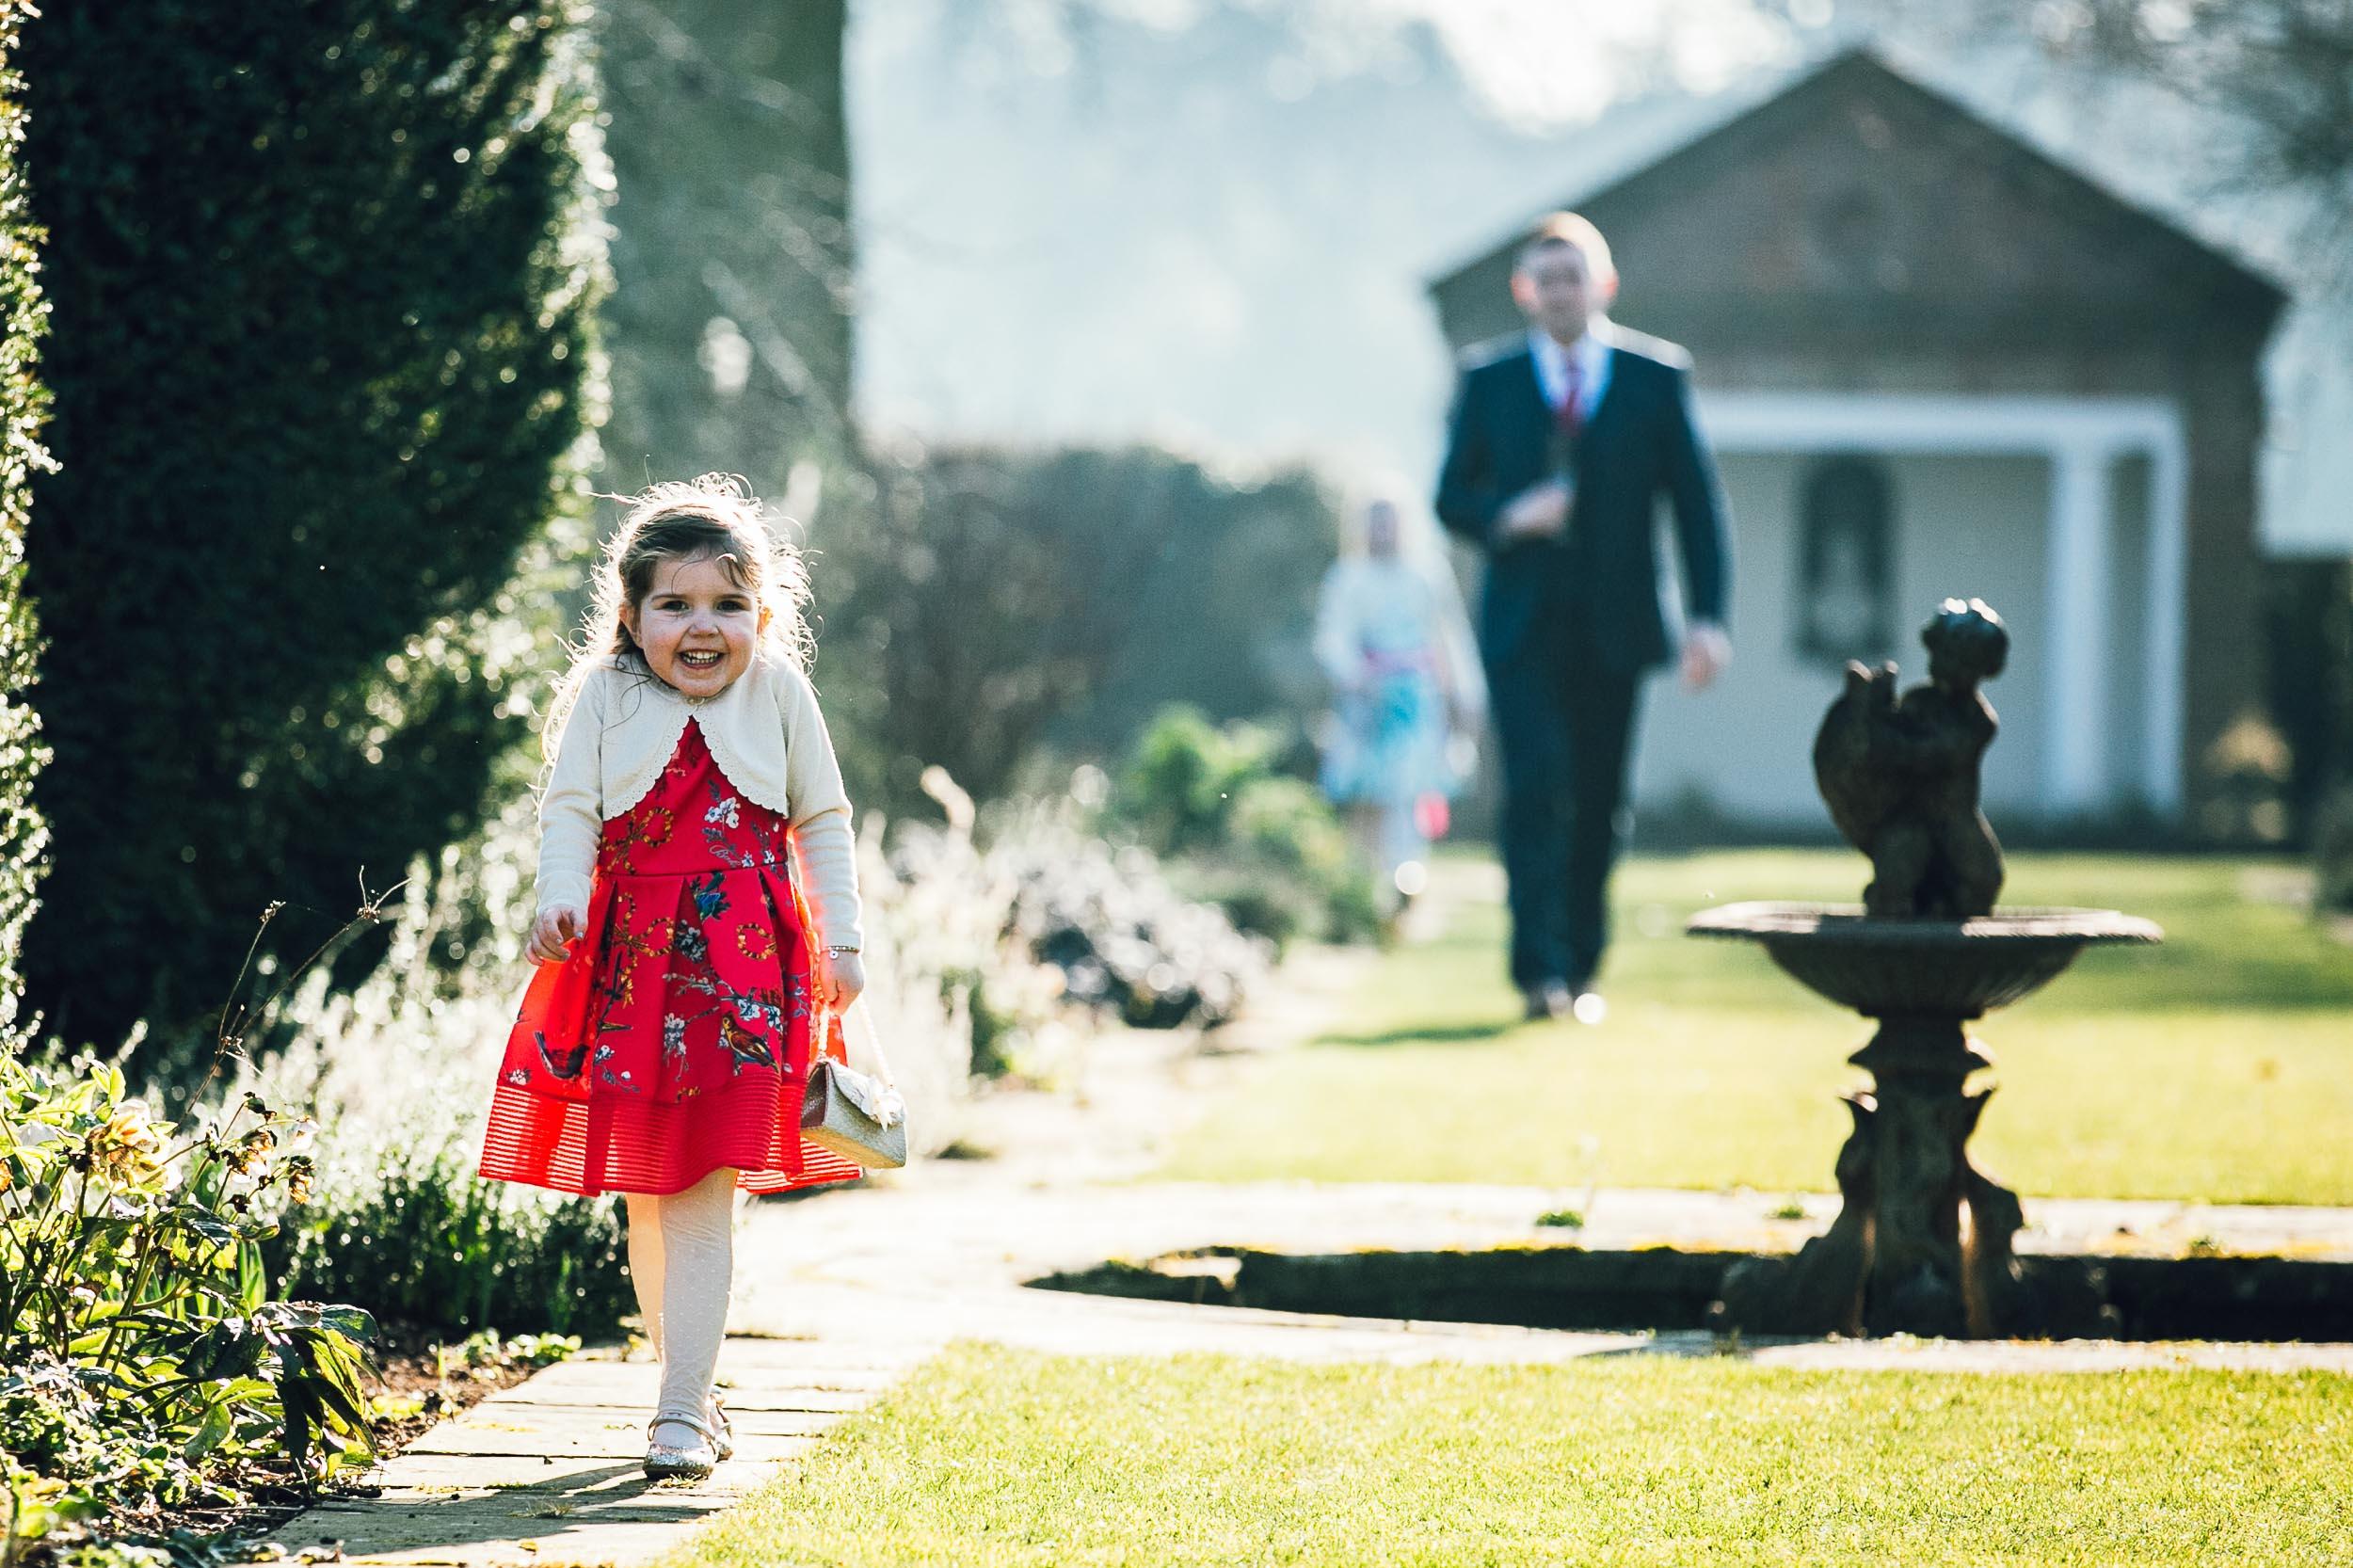 micklefield-hall-wedding-photographer 045.jpg